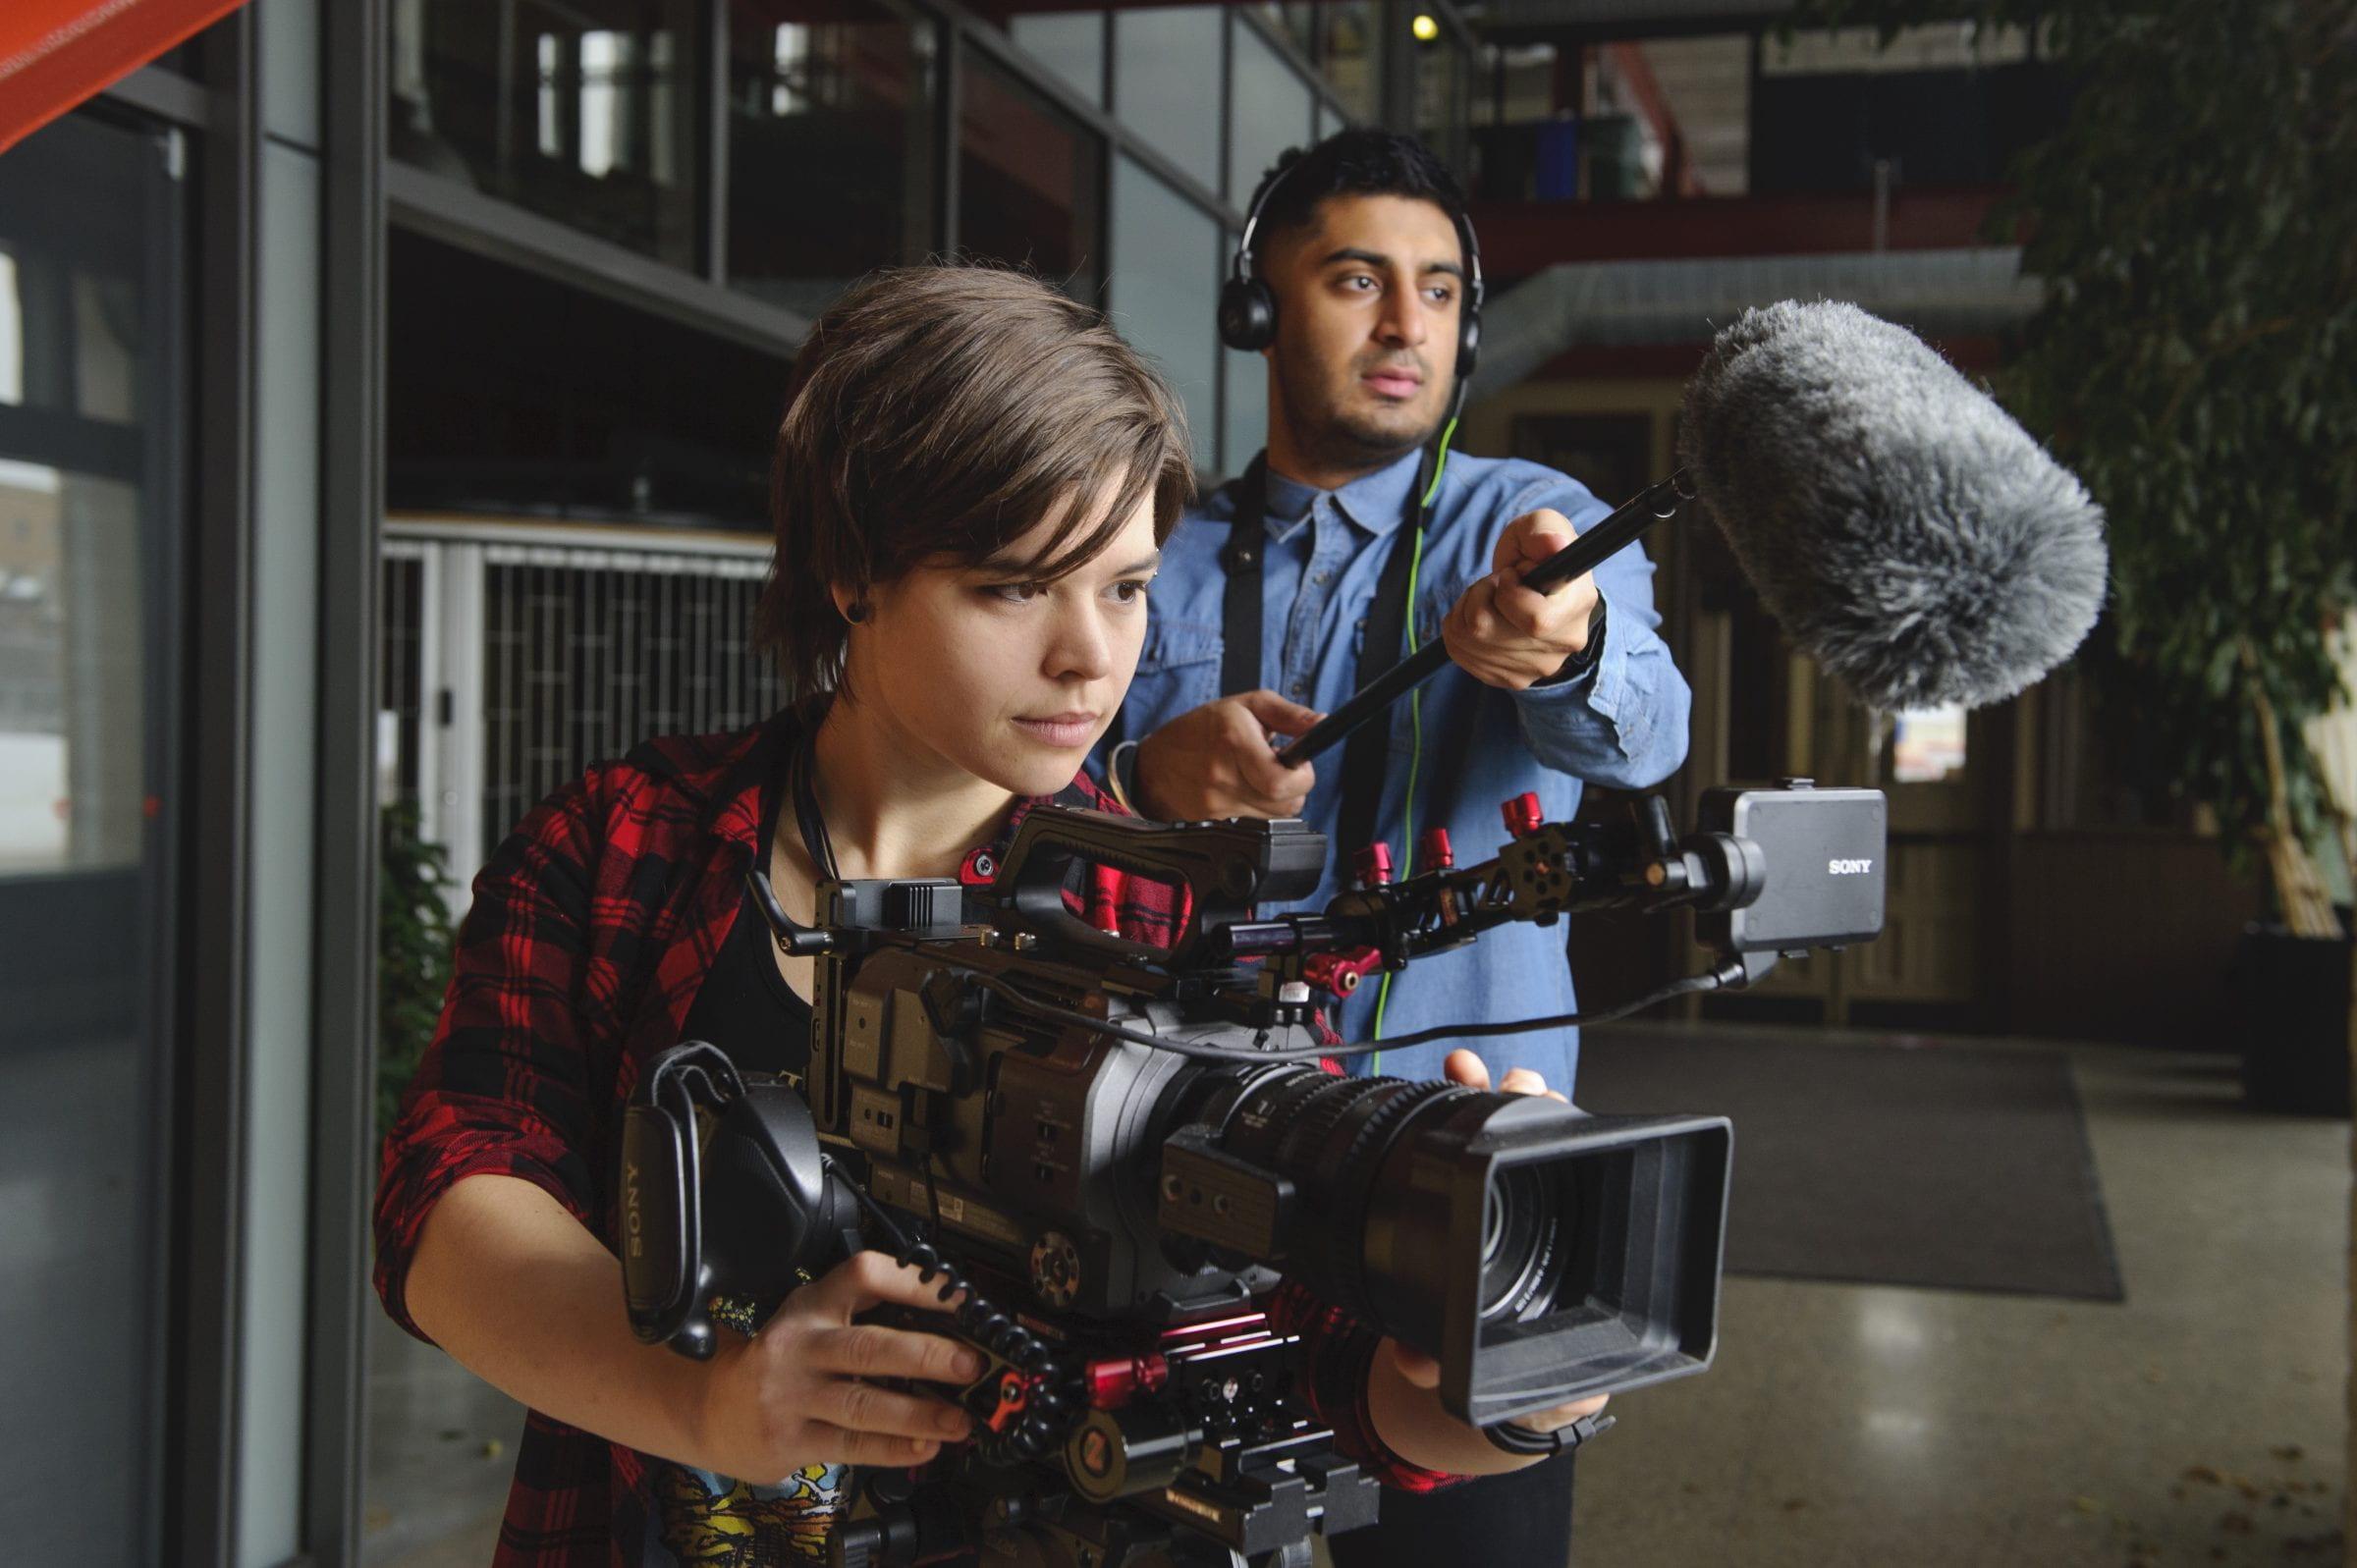 RRC grads use cutting-edge film equipment